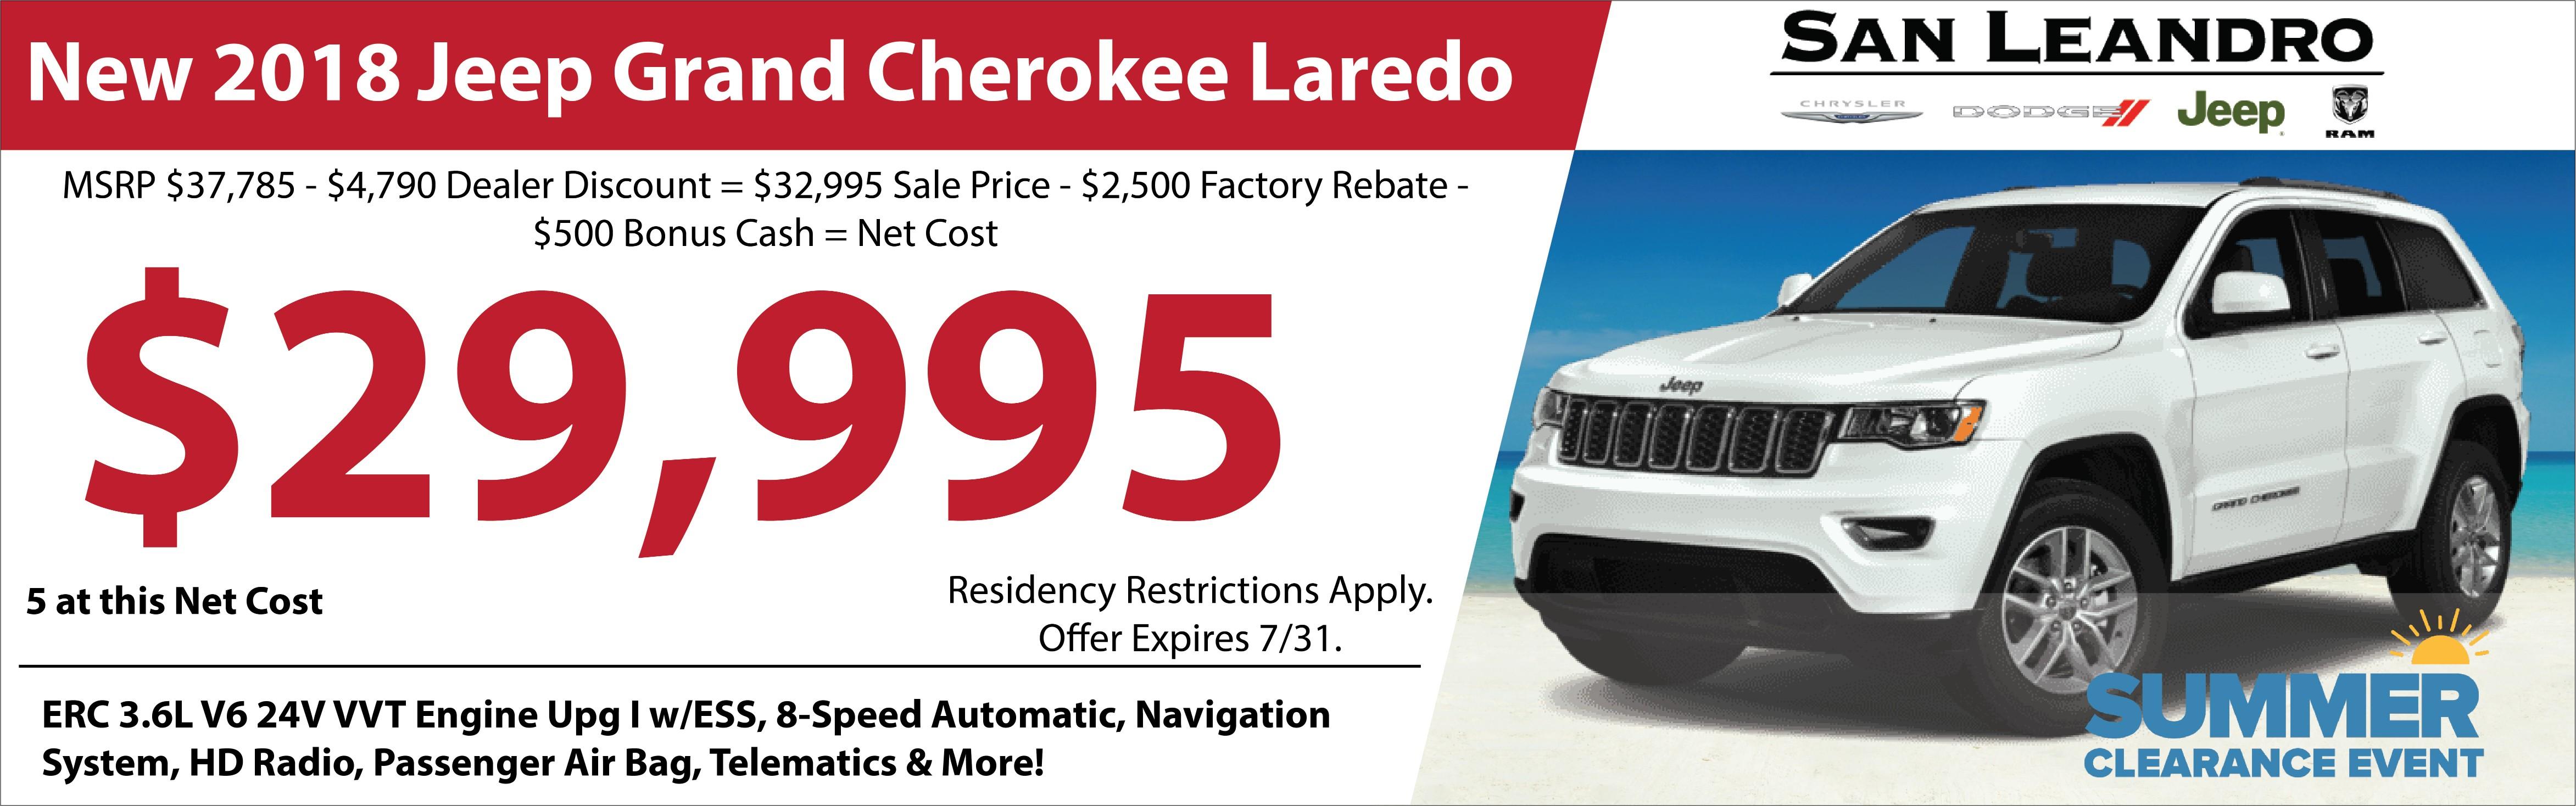 New Chrysler Dodge Jeep Ram Specials San Leandro CA